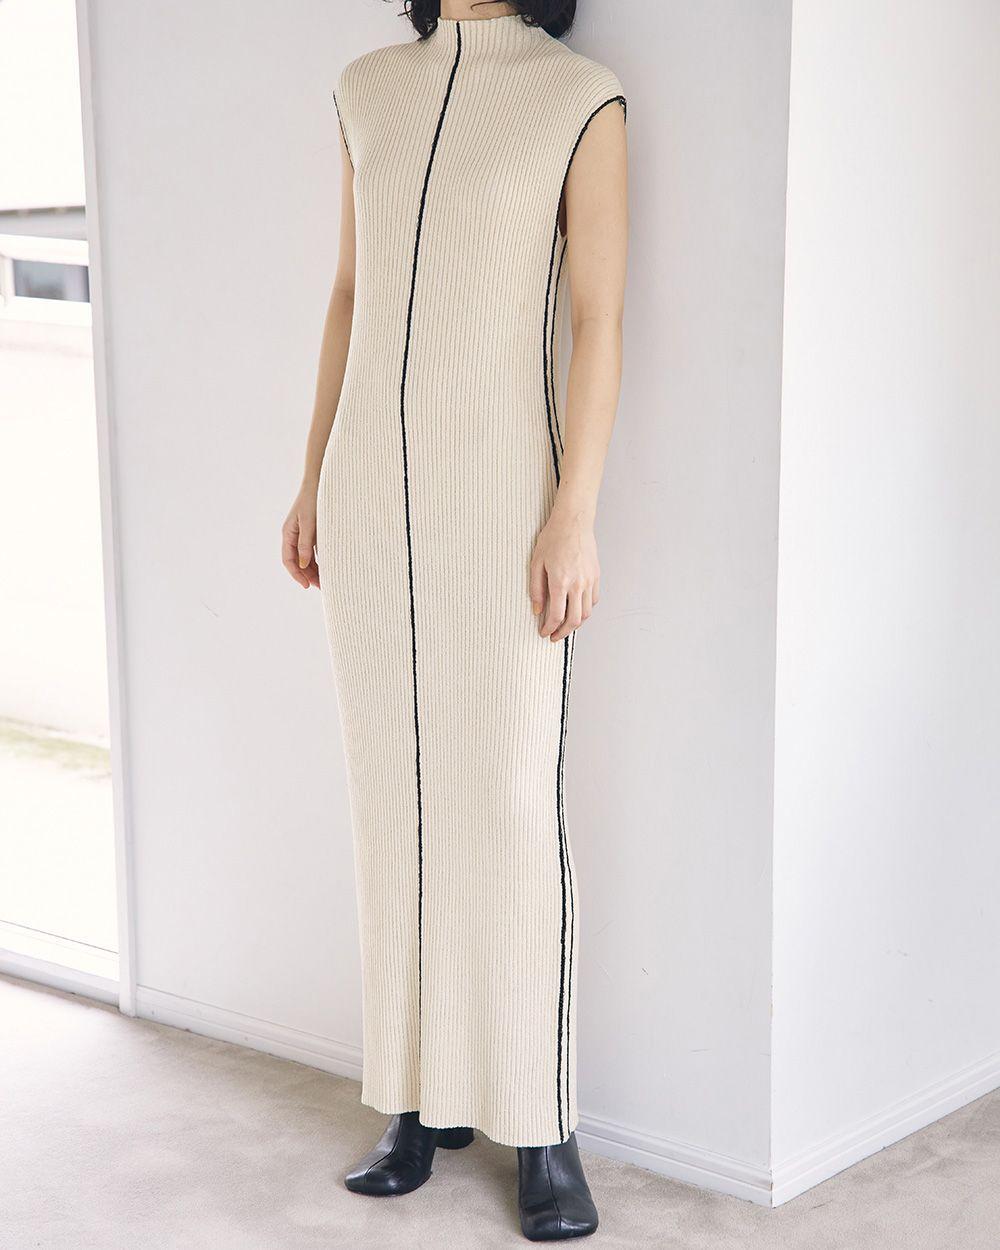 Stitch Knit Dress